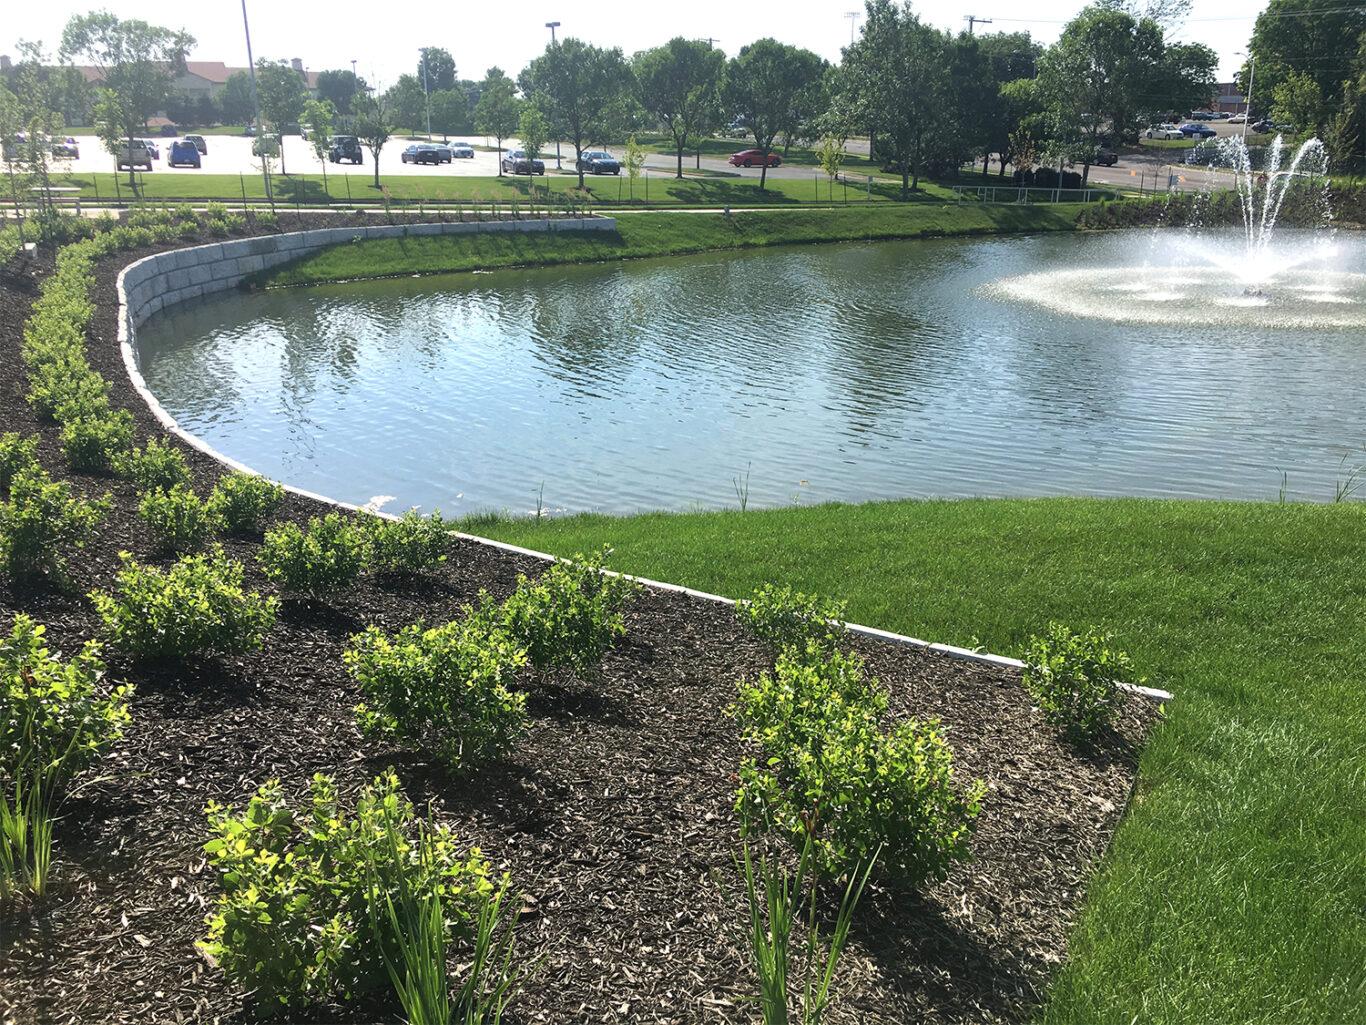 Overland Park Kansas Campus shows Retention pond health